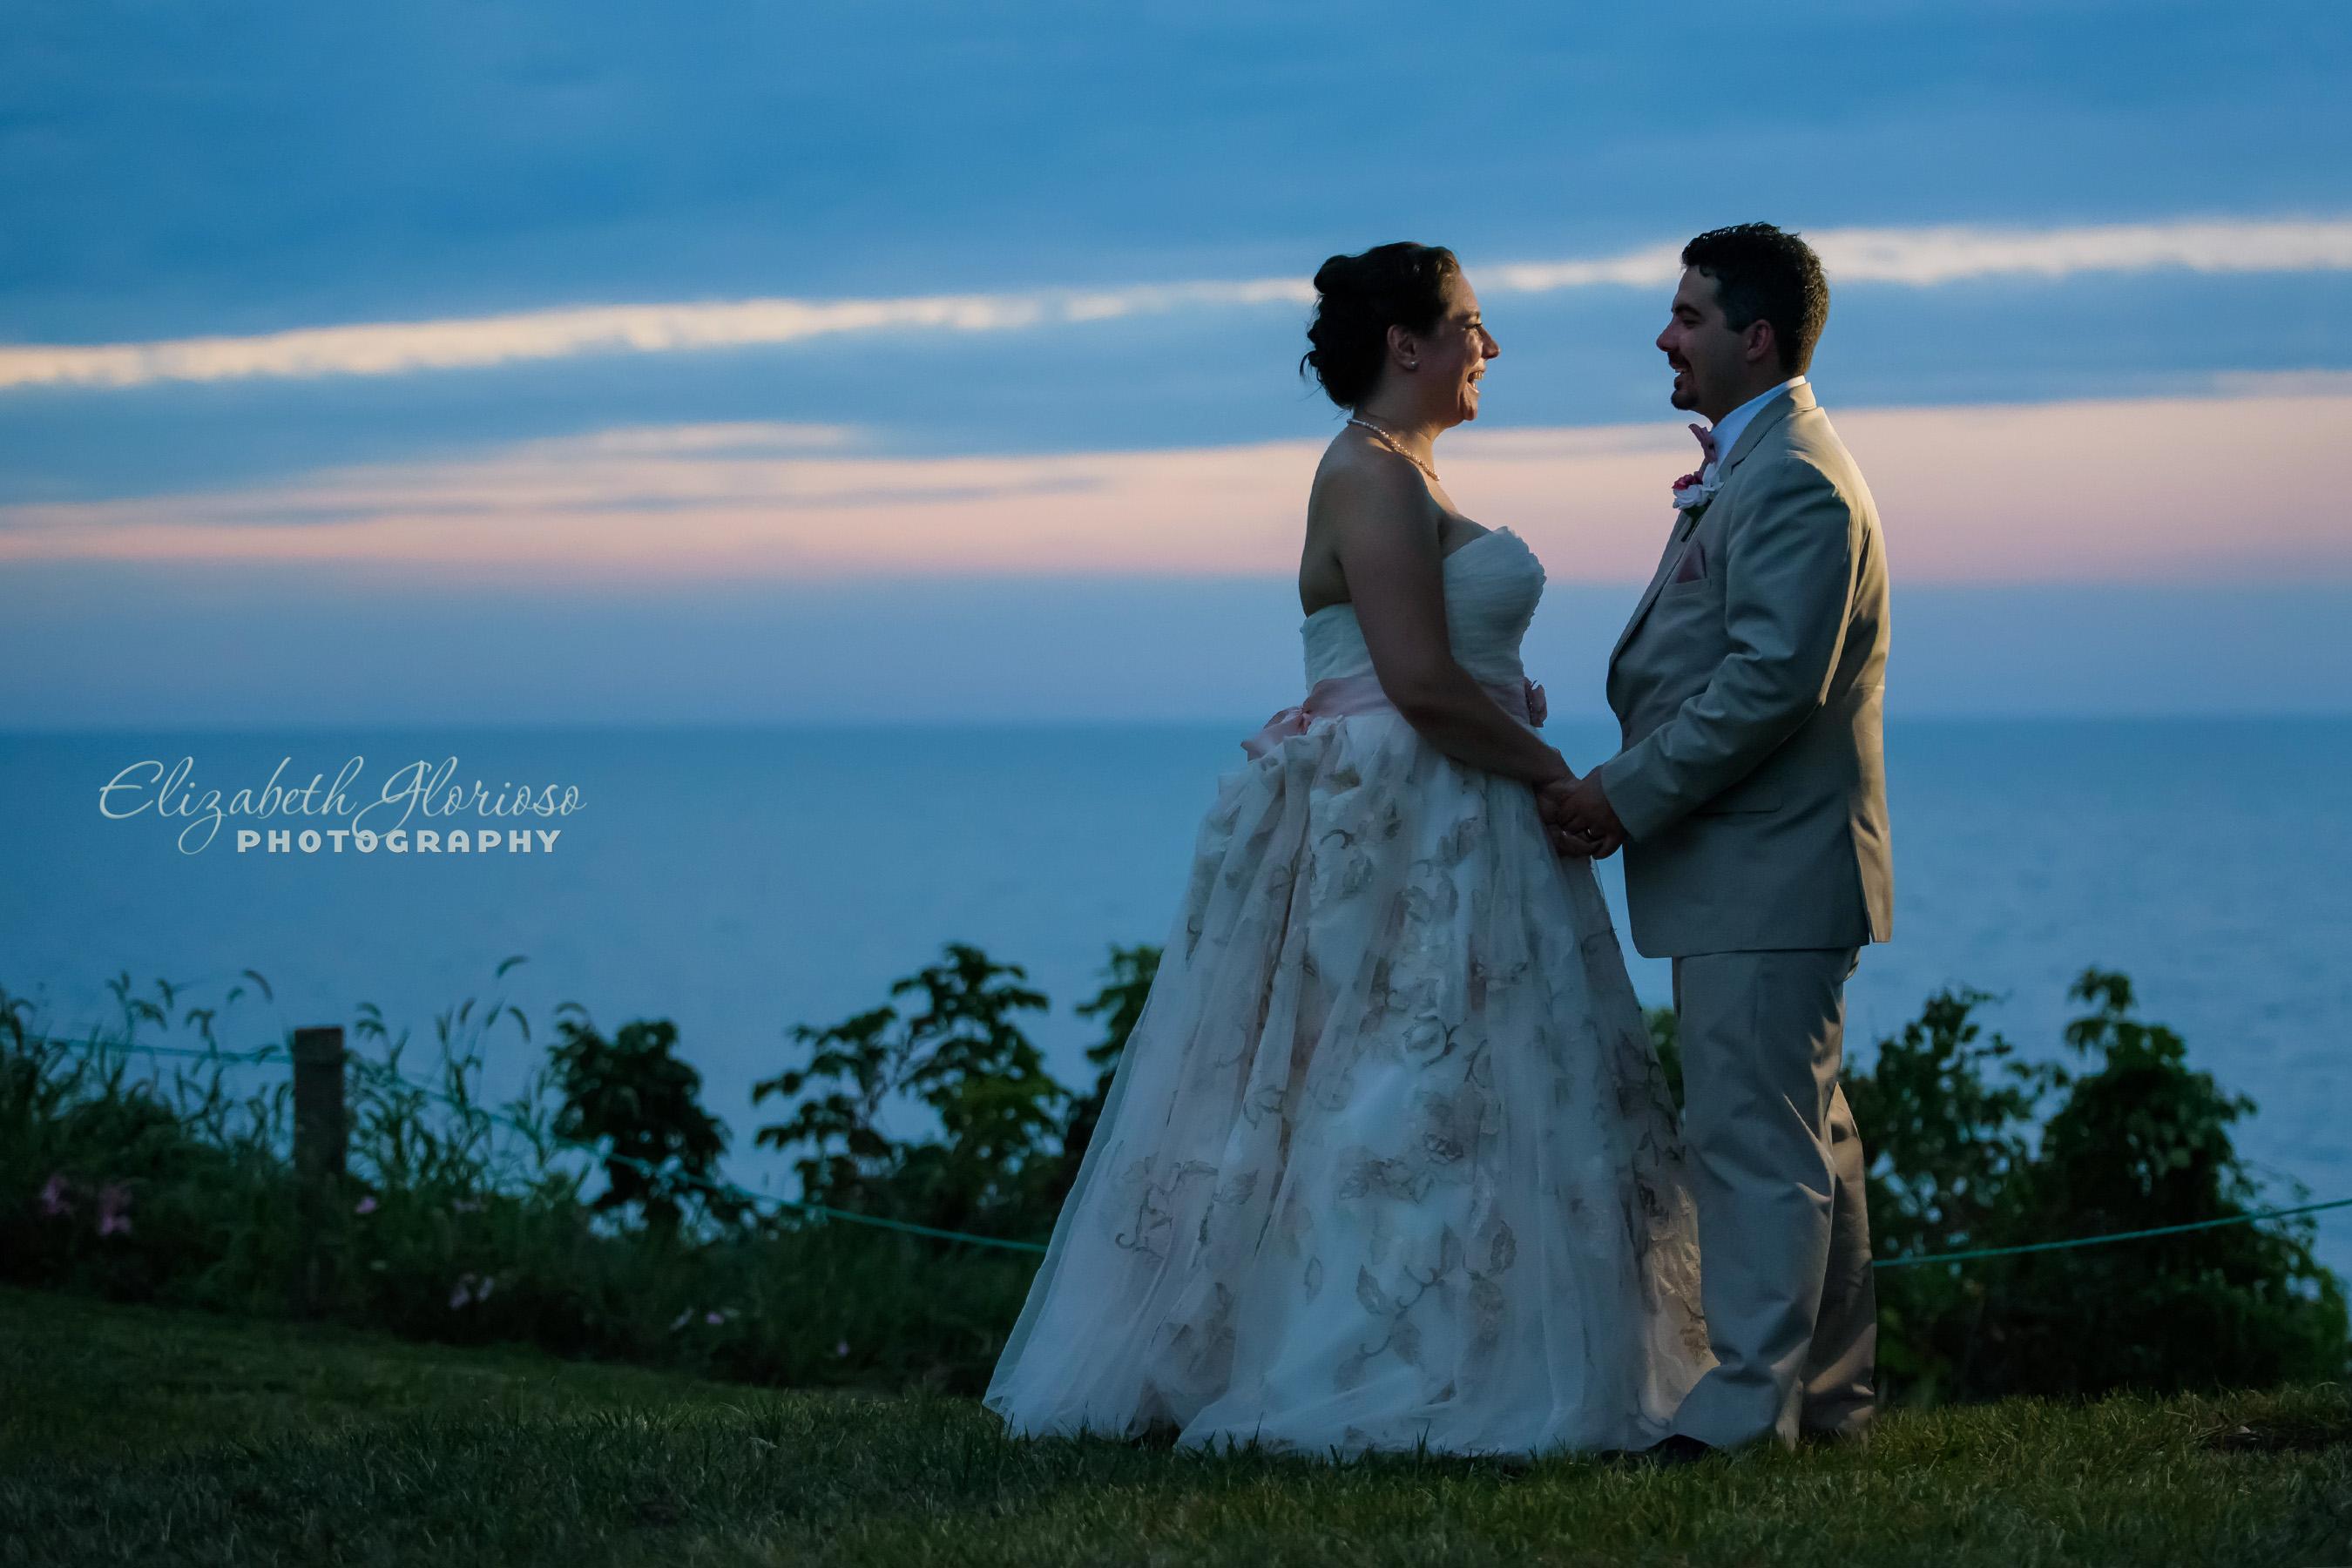 Vermilion_wedding_Glorioso Photography_1049